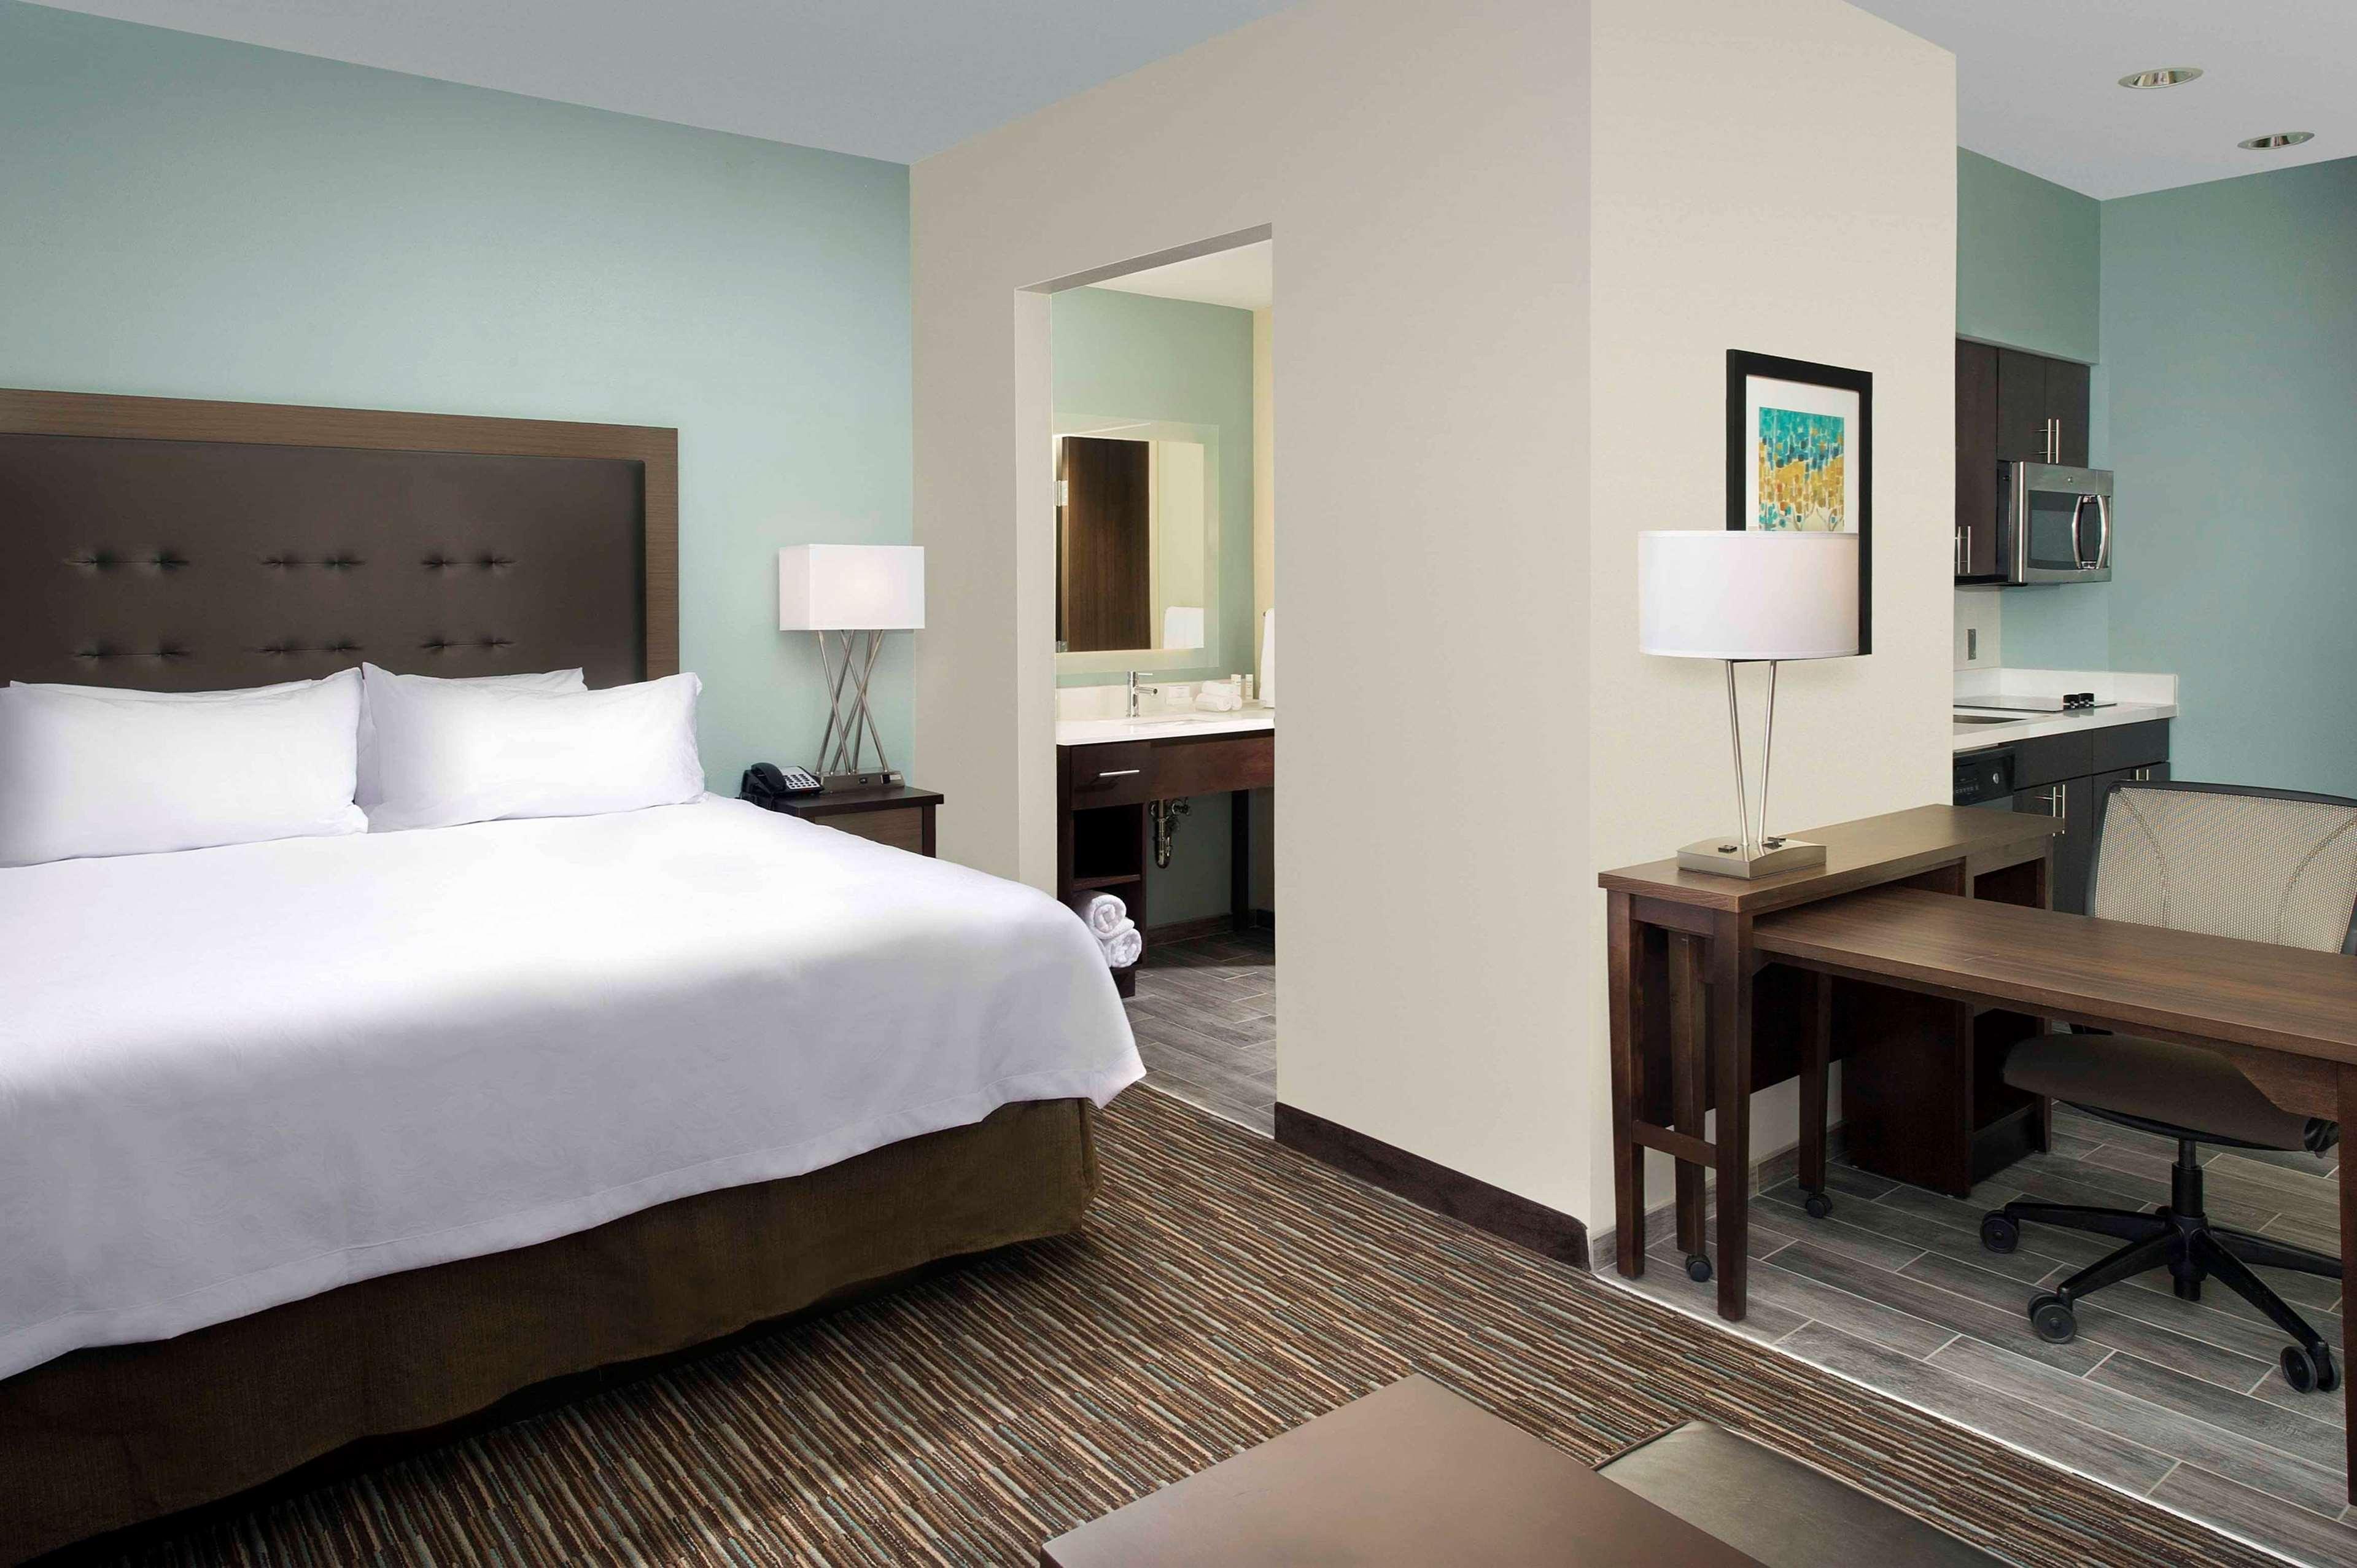 Homewood Suites By Hilton San Antonio Airport San Antonio Texas Tx